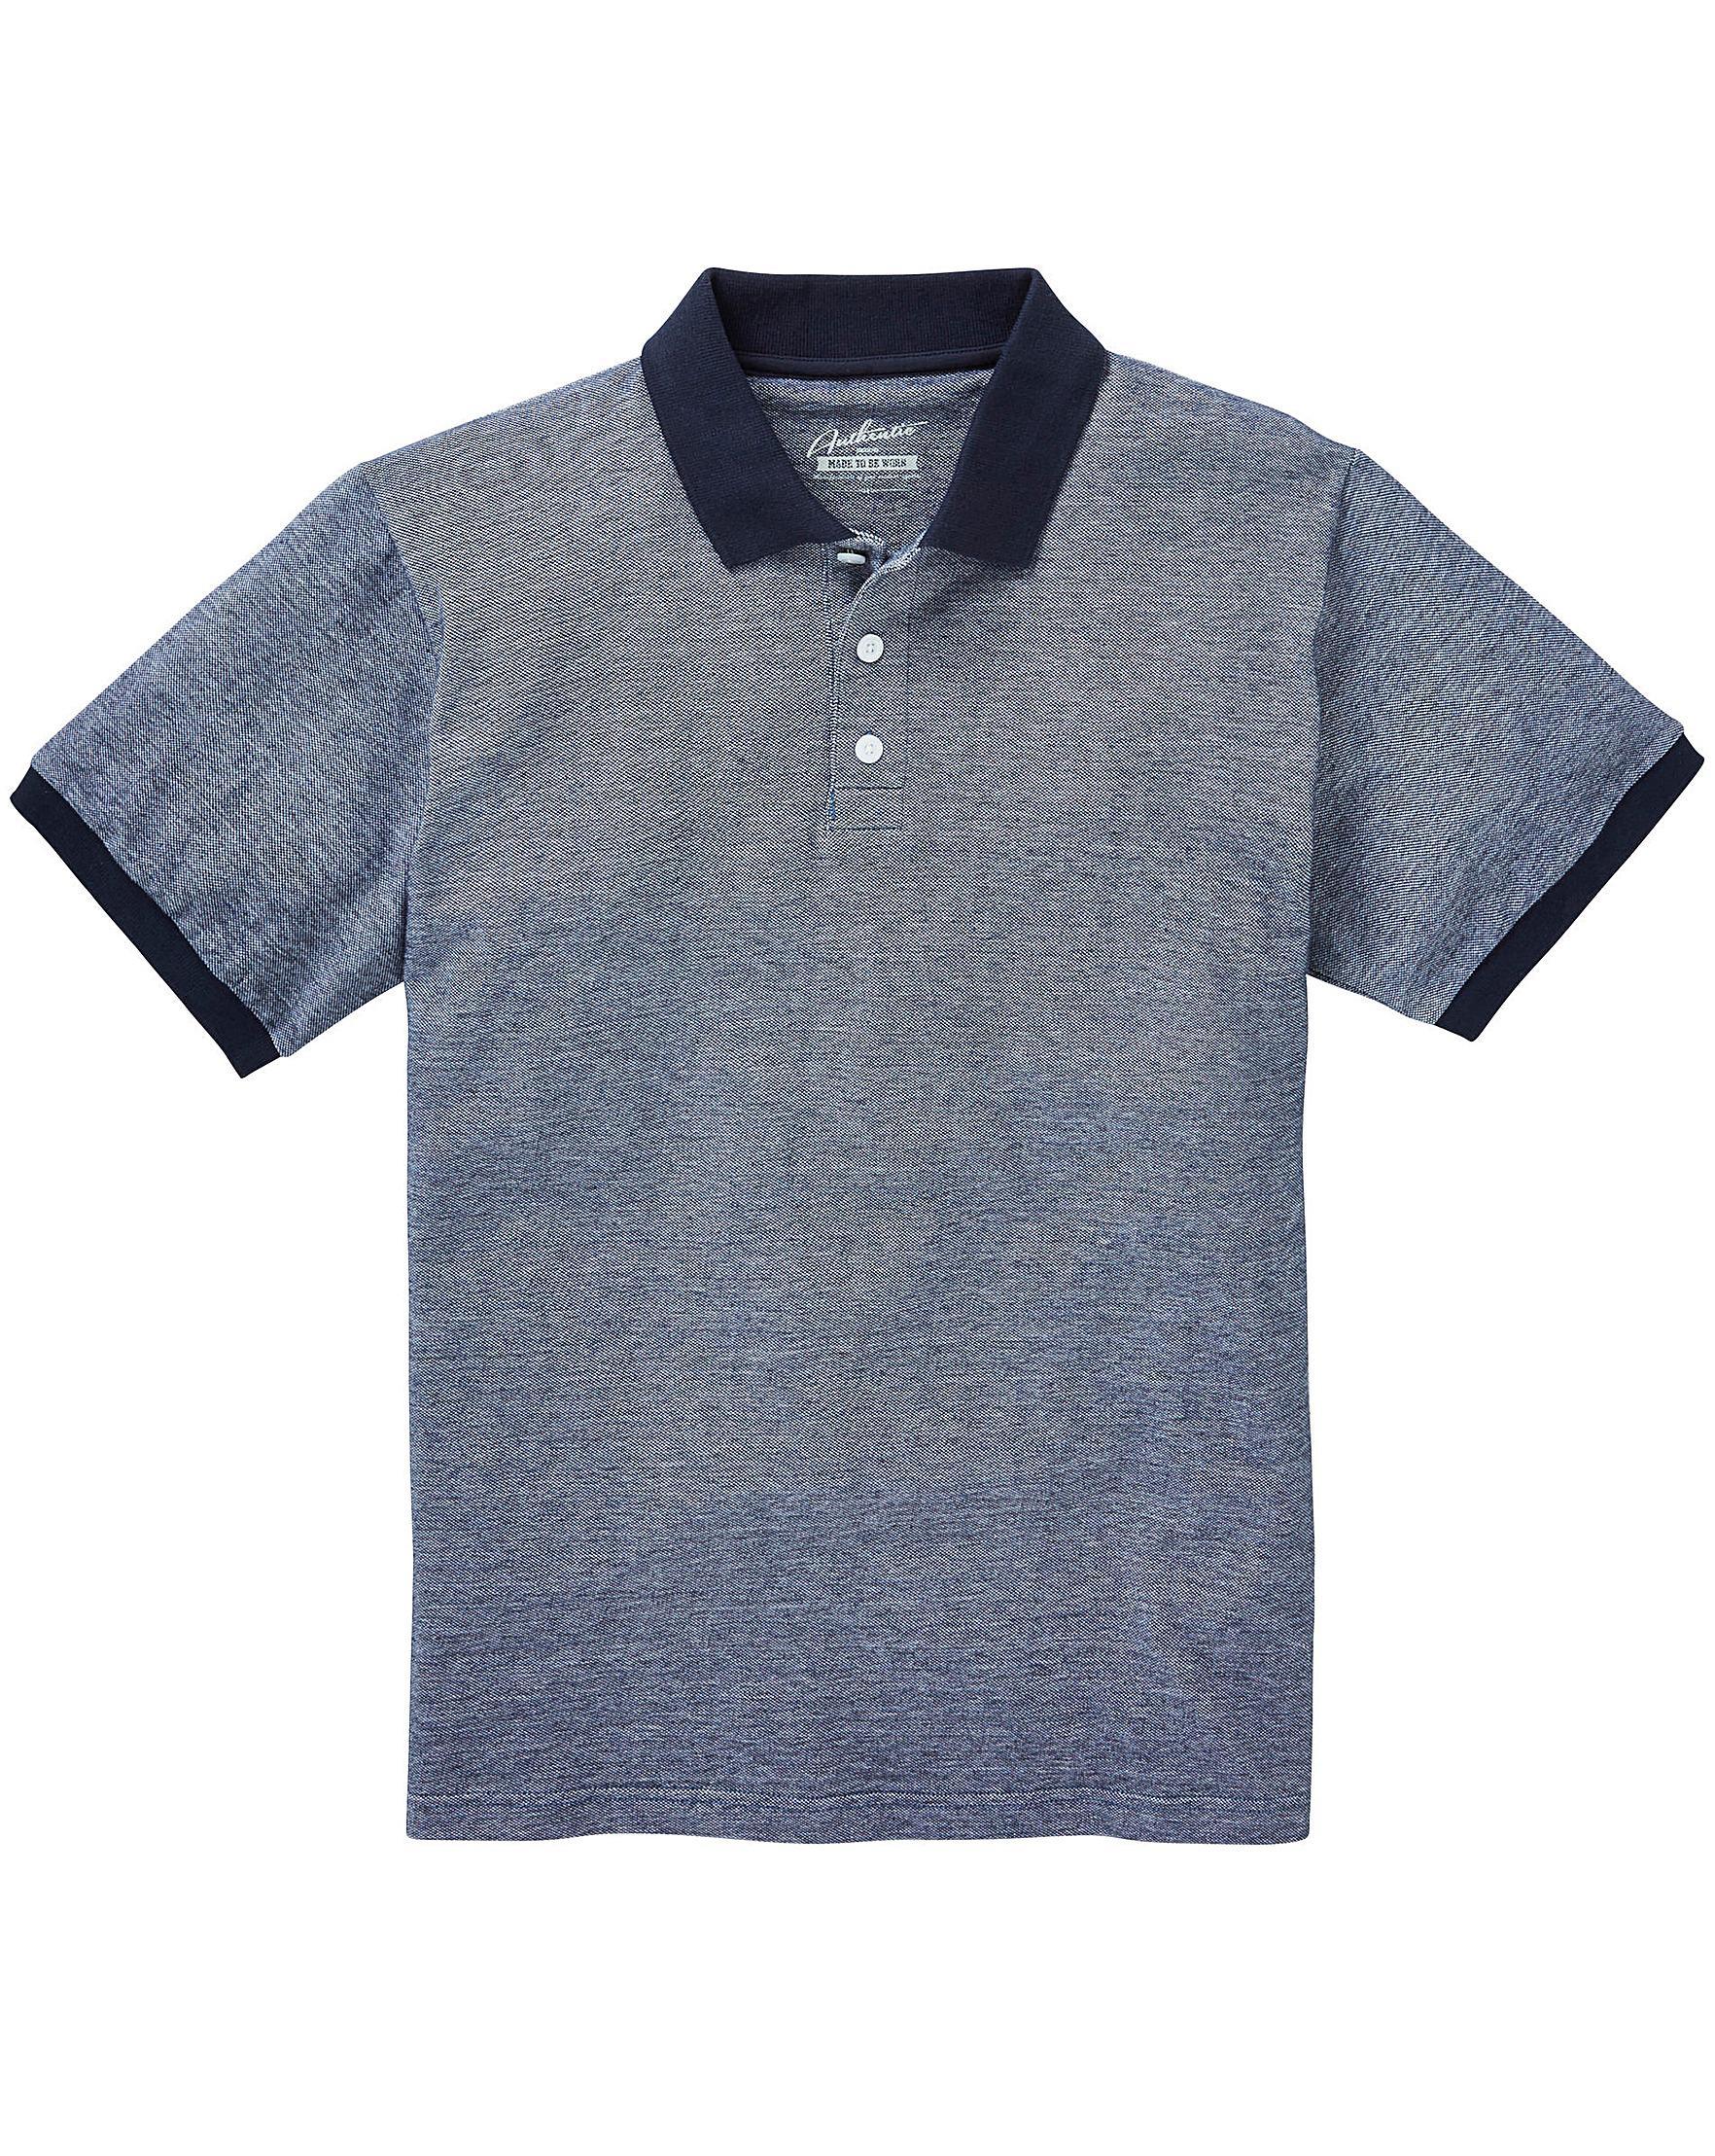 Mens Shango Oxford Pique Polo Shirt Jacamo Outlet Latest Collections uOXPcSgh